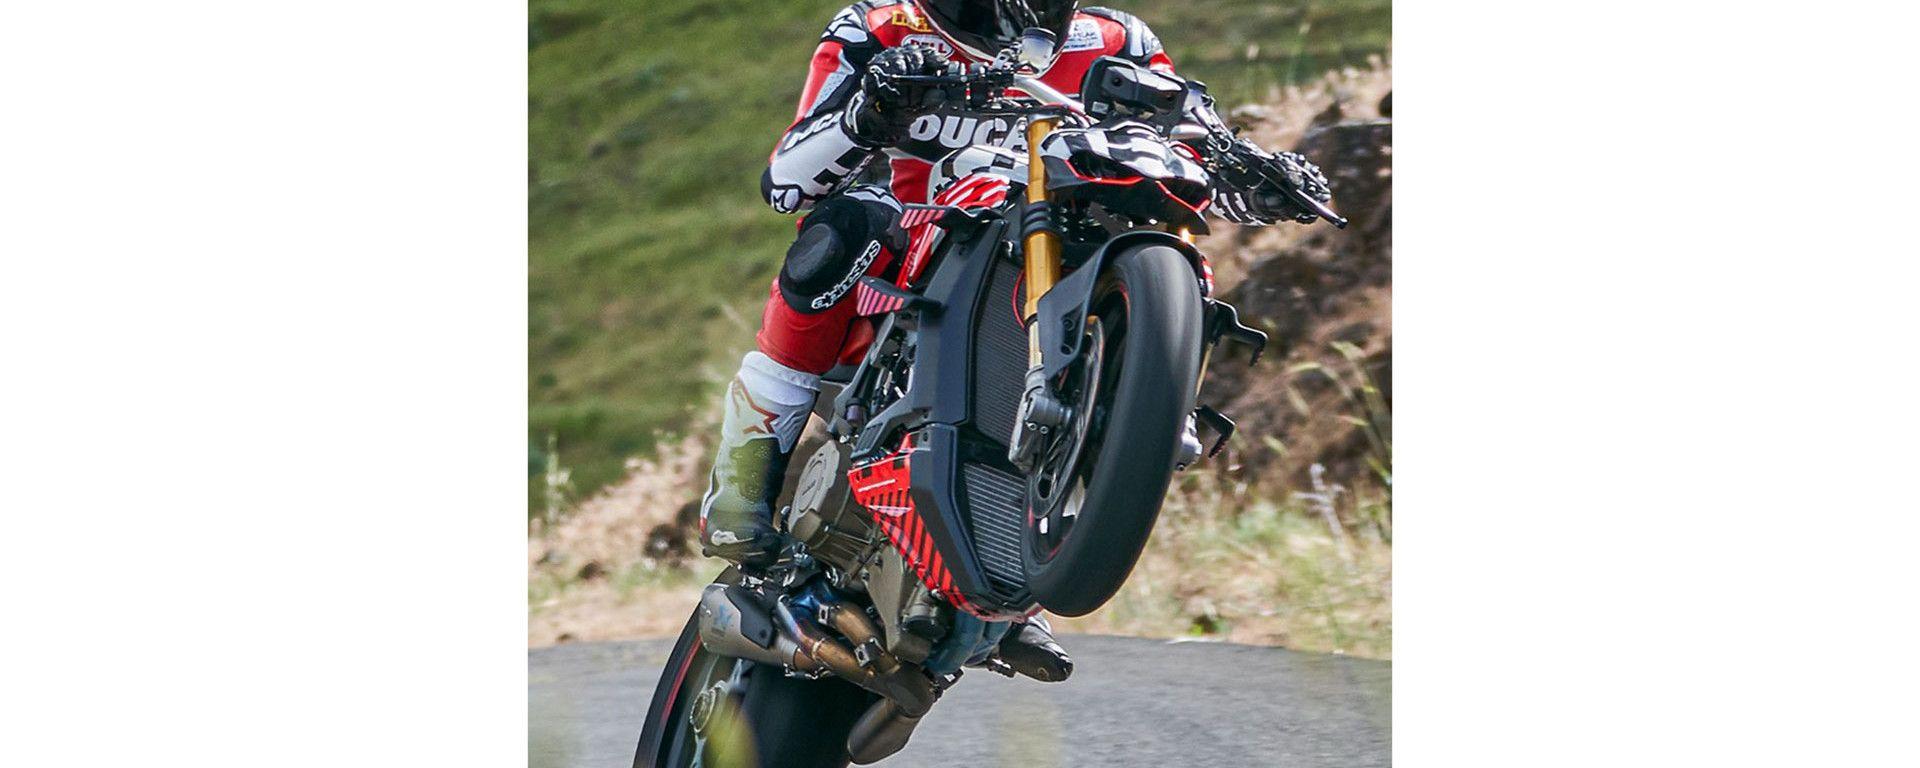 Ducati Streetfighter V4 Prototype alla Pikes Peak